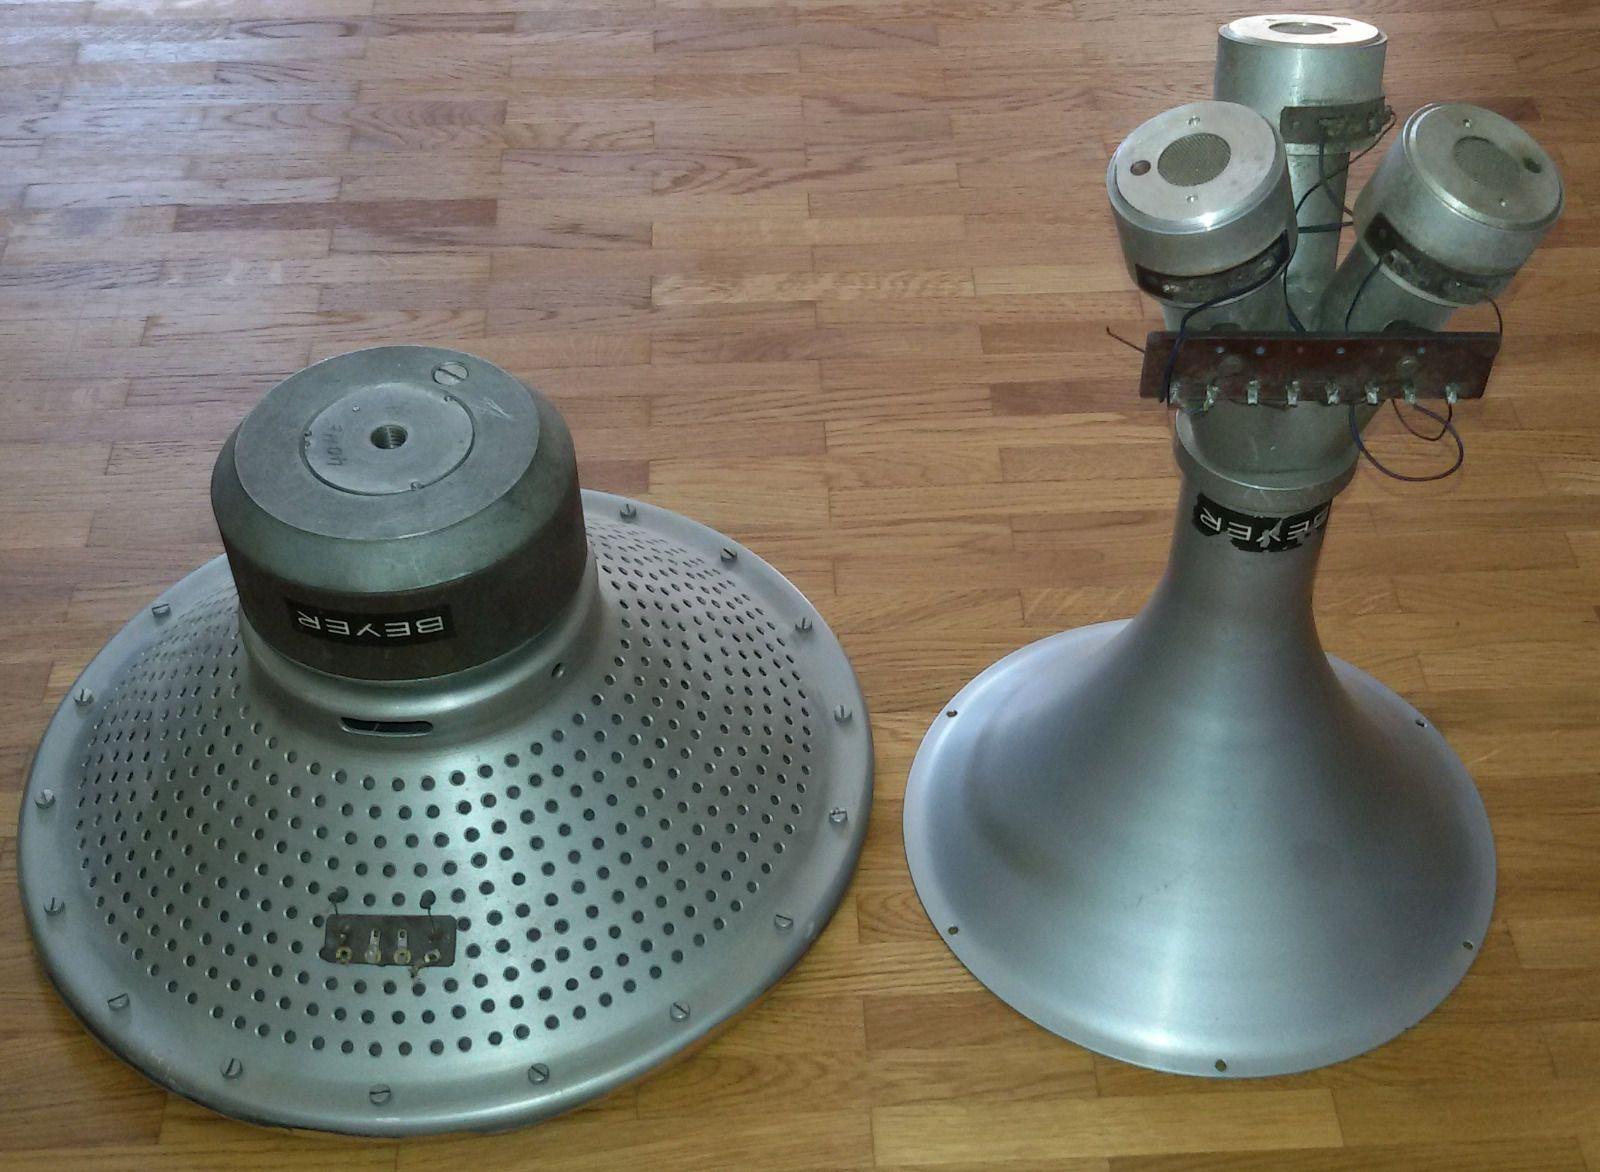 Berühmt 50 S Küchenspüle Drama Fotos - Küchen Design Ideen ...